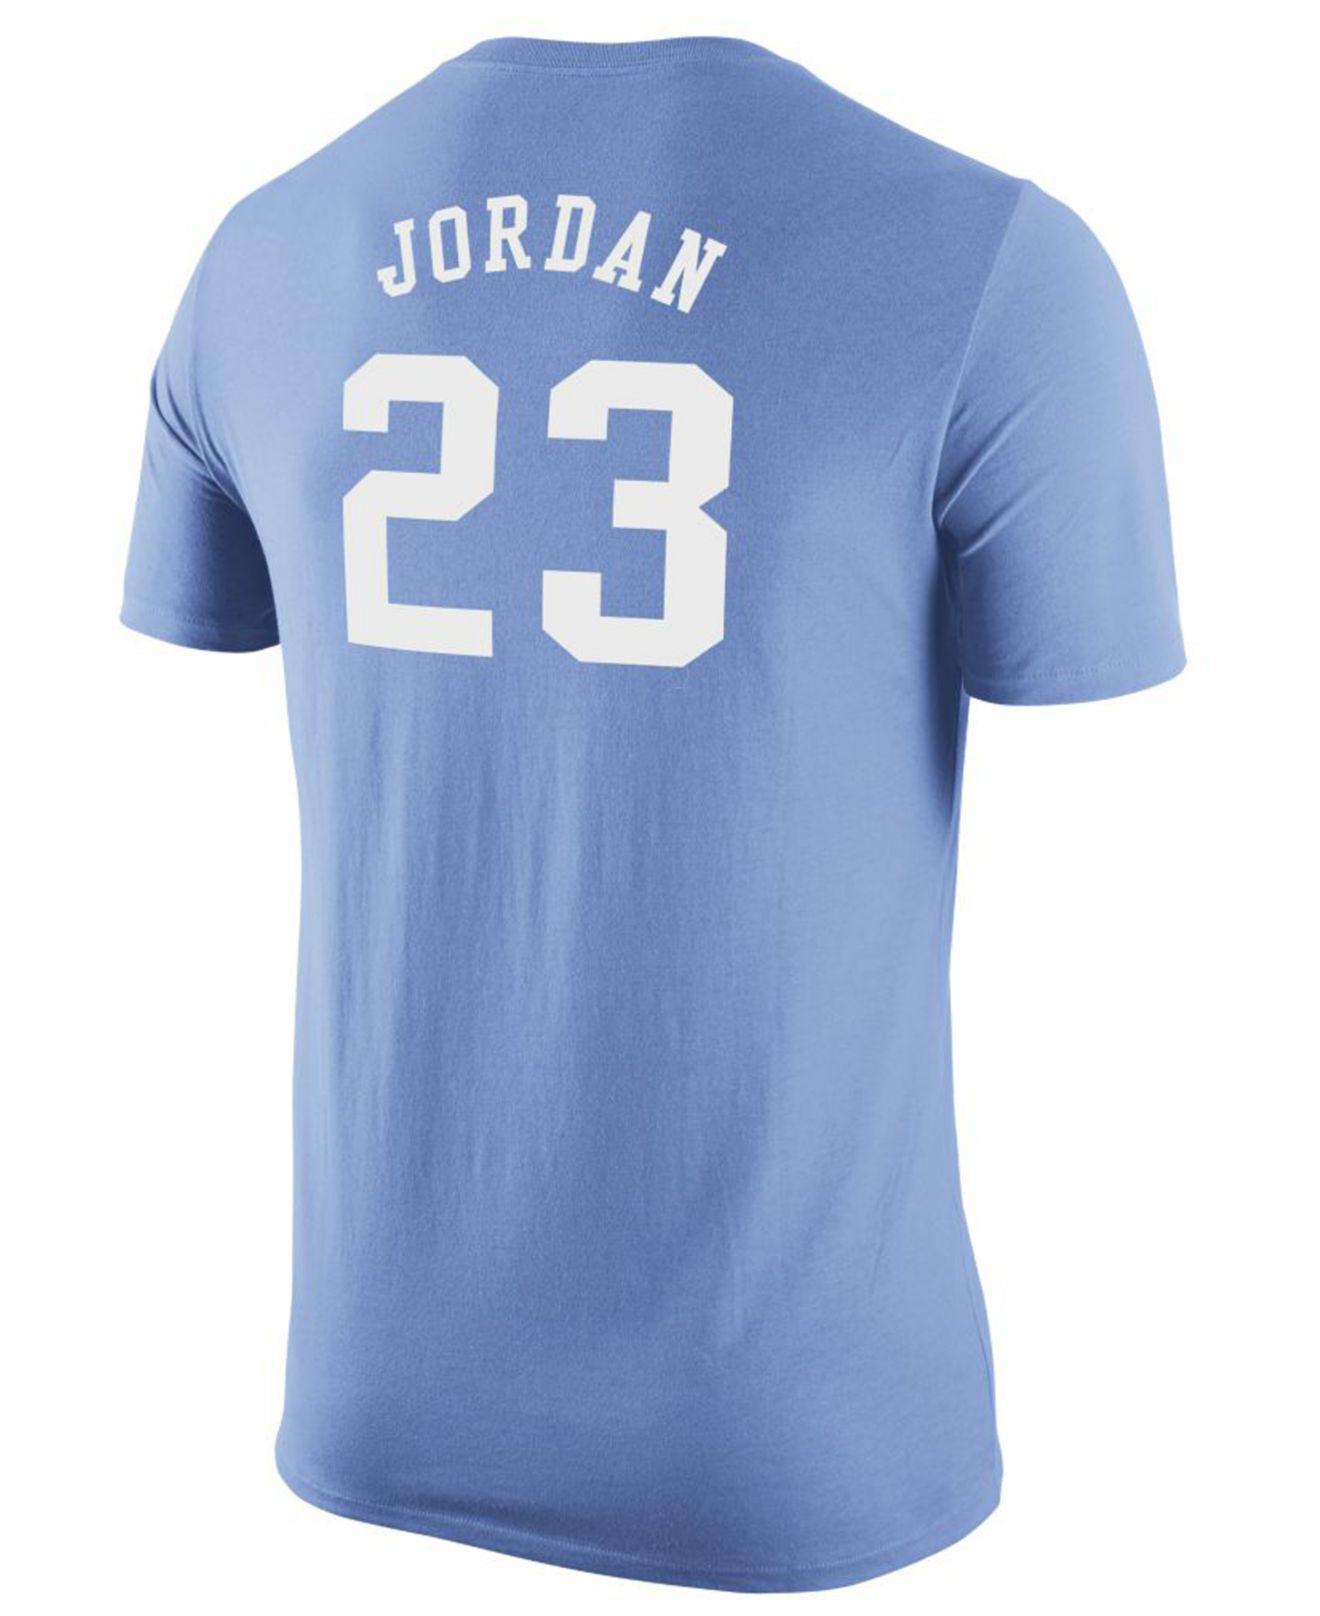 12670573329a Nike. Blue Men s Michael Jordan North Carolina Tar Heels Future Star  Replica T-shirt